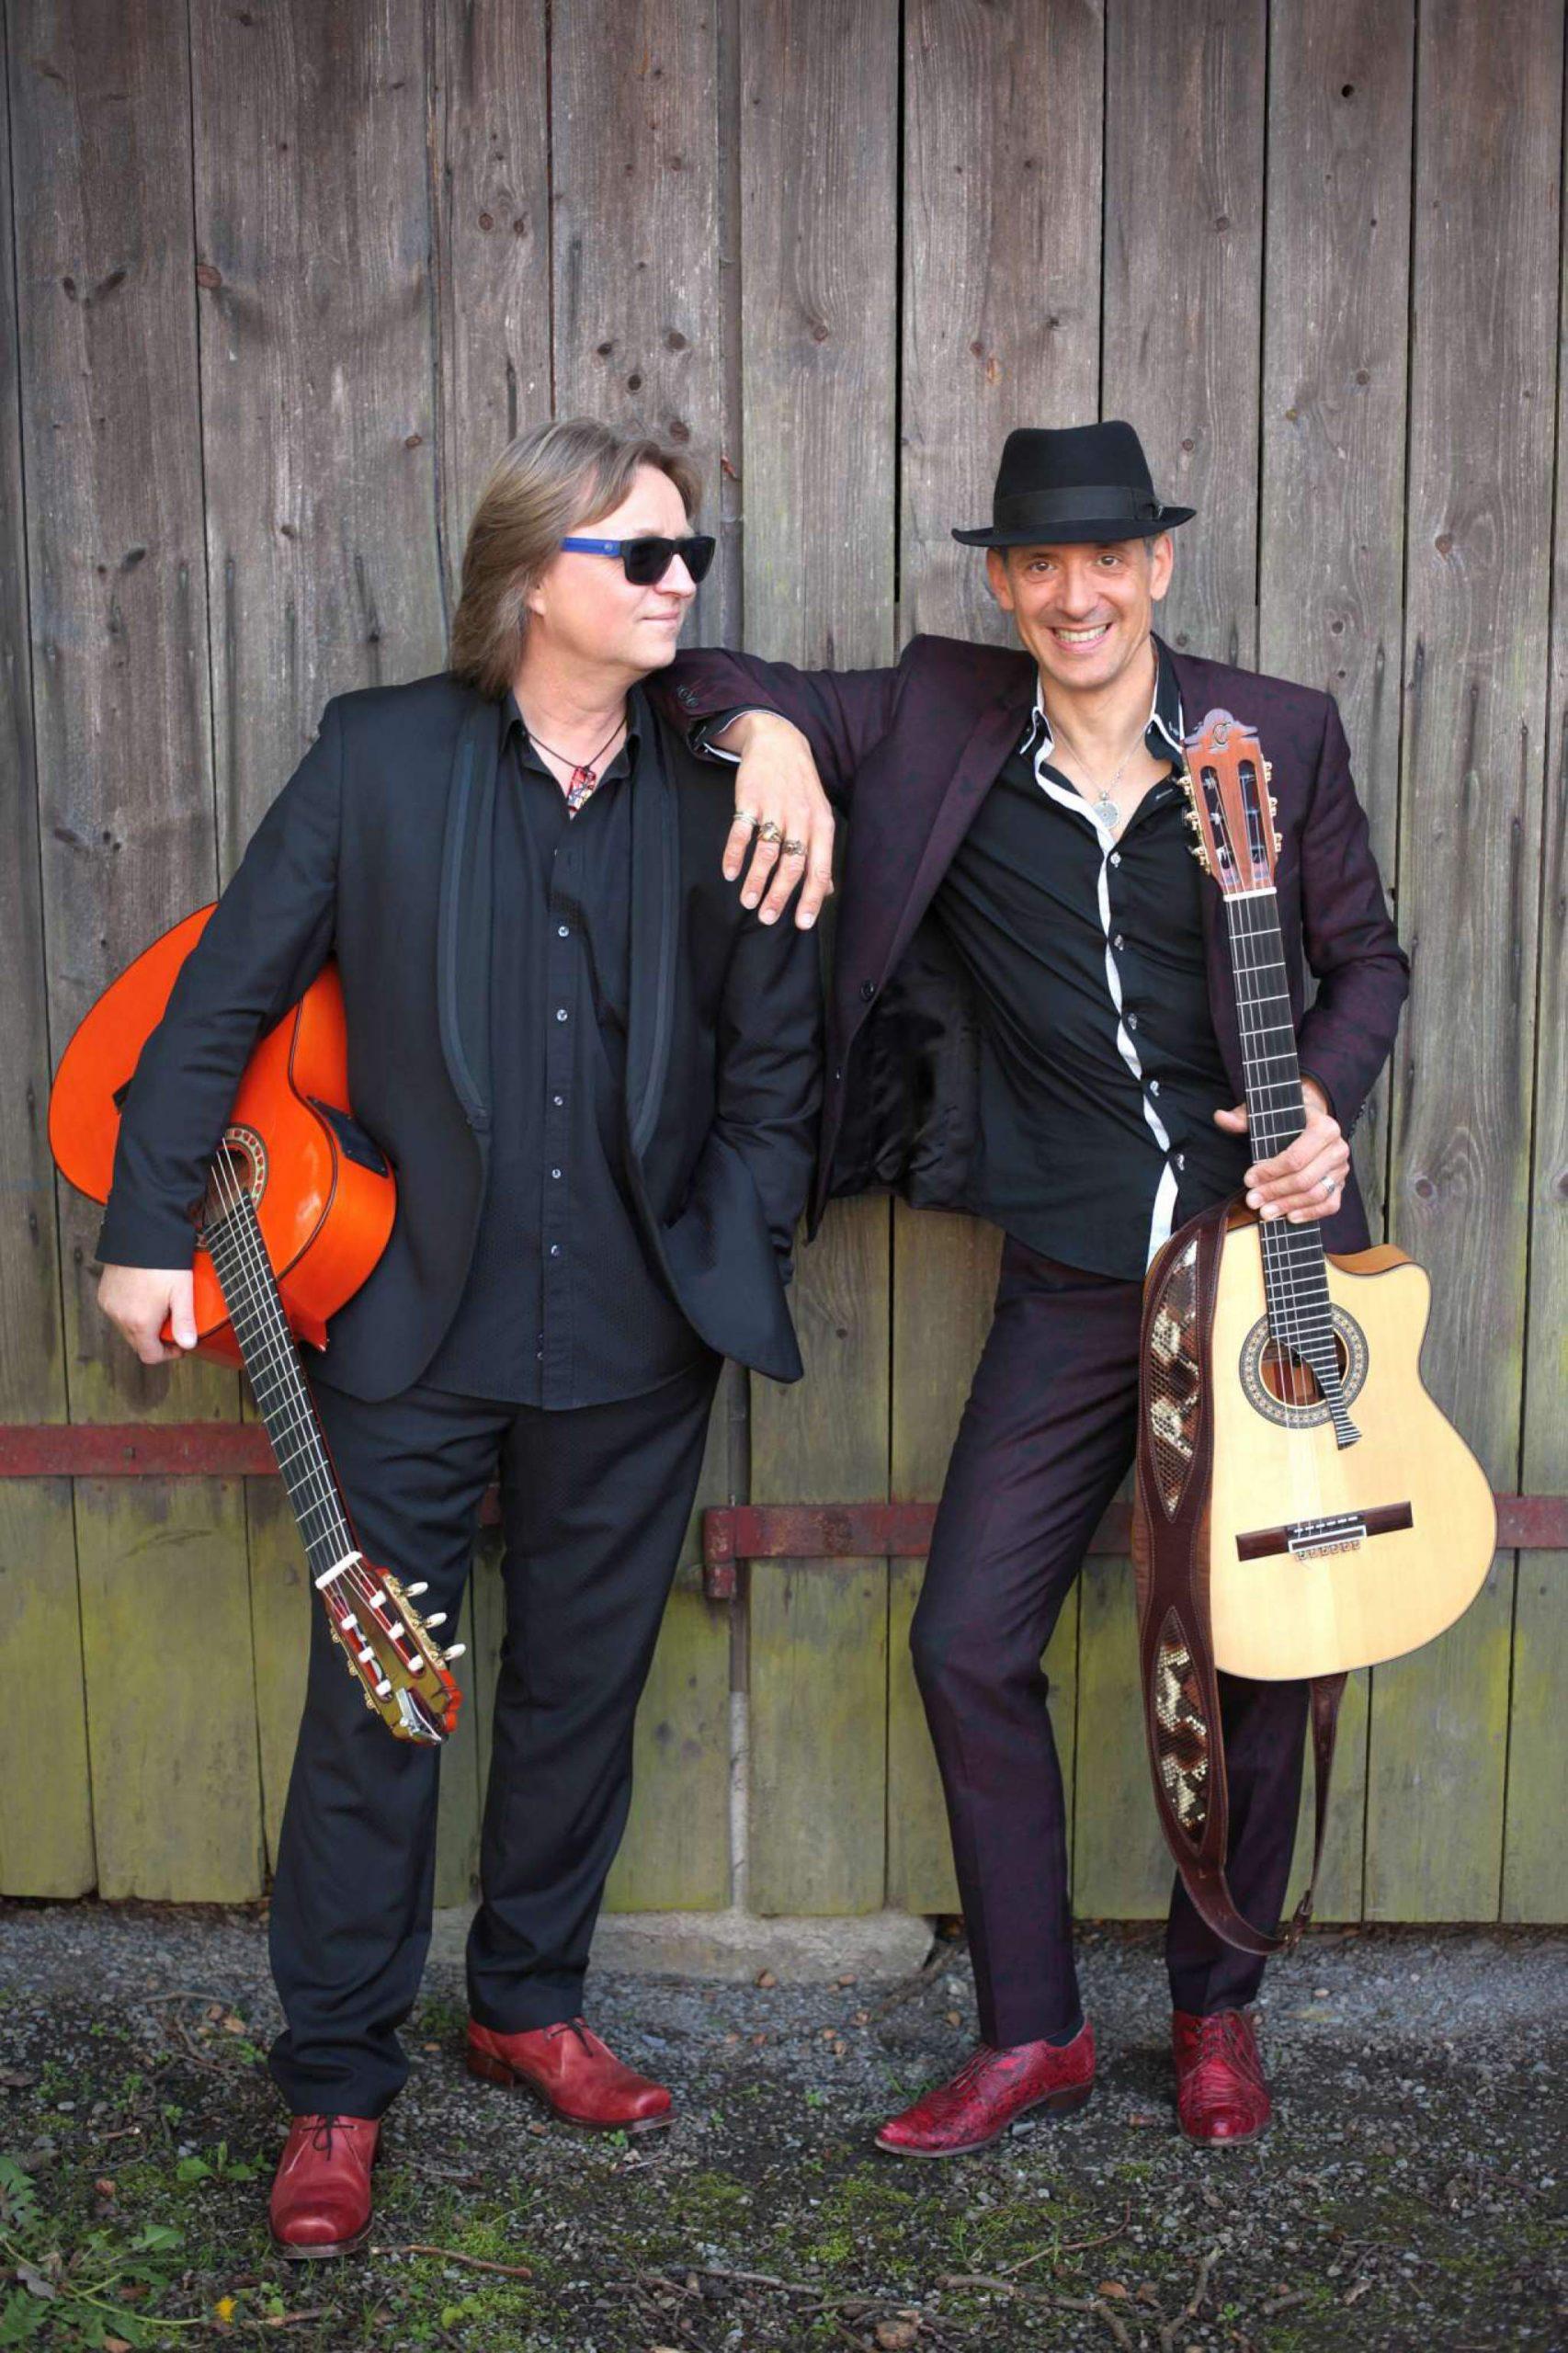 Magic acustic Guitars – instrumentale Gitarrenpower zu Gast im Gleis 1 in Meckenbeuren